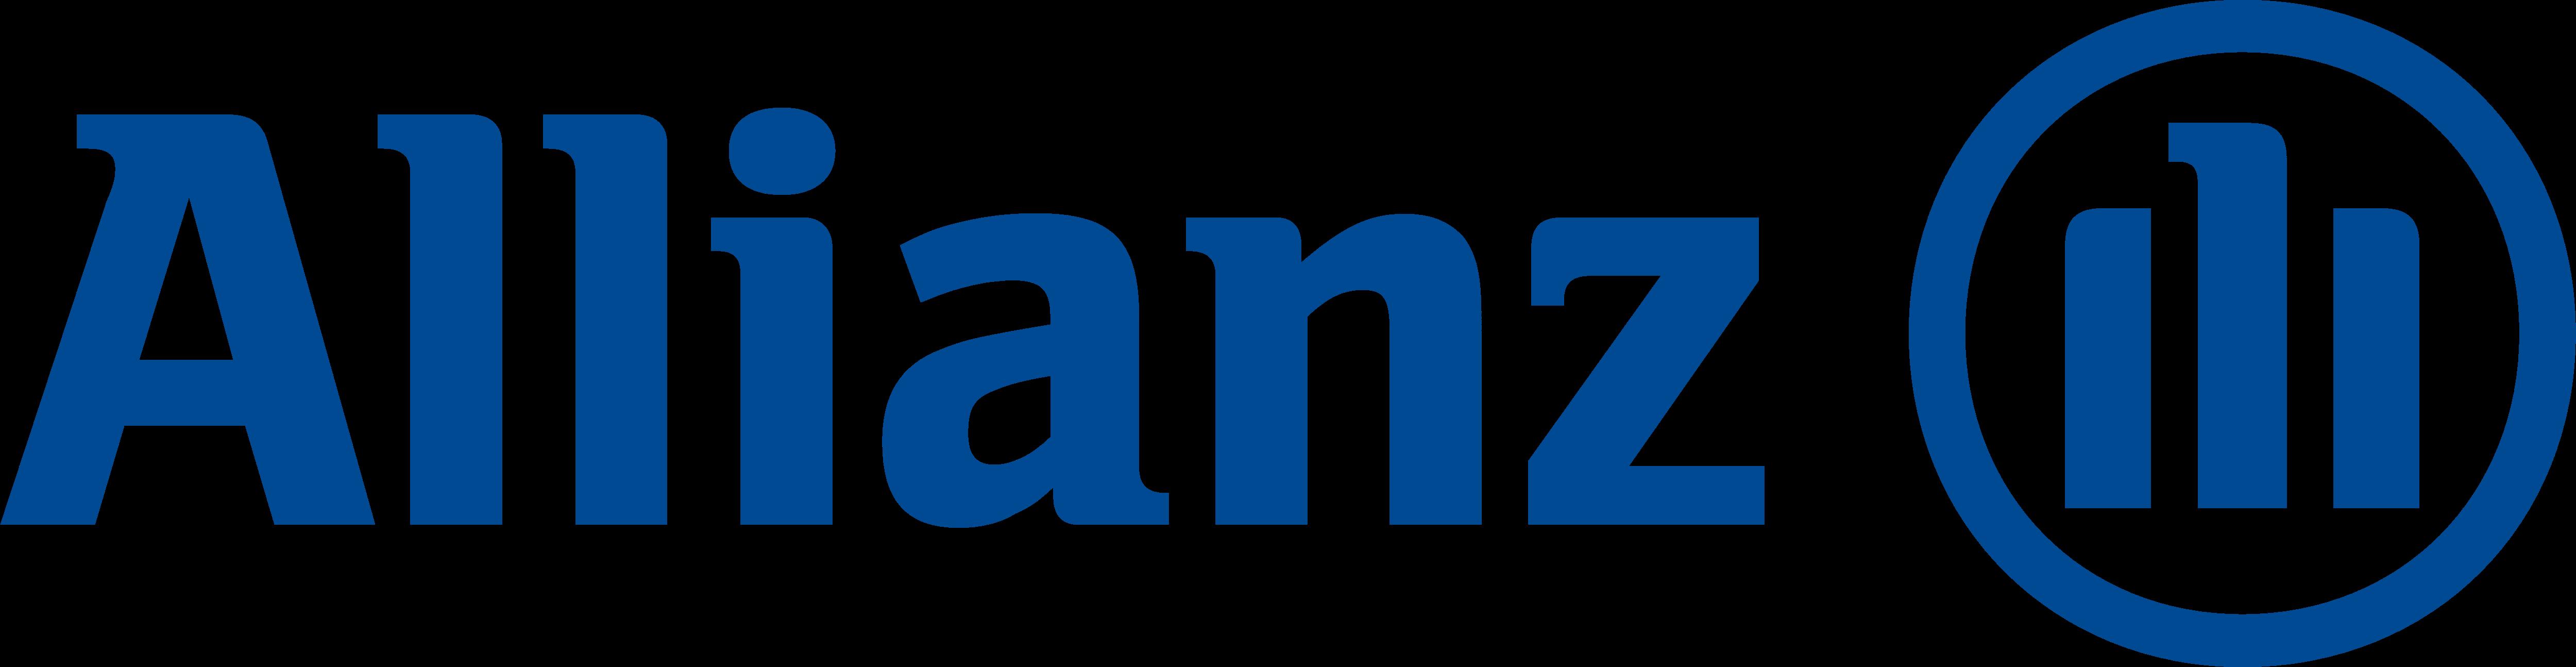 Allianz_logo_logotype